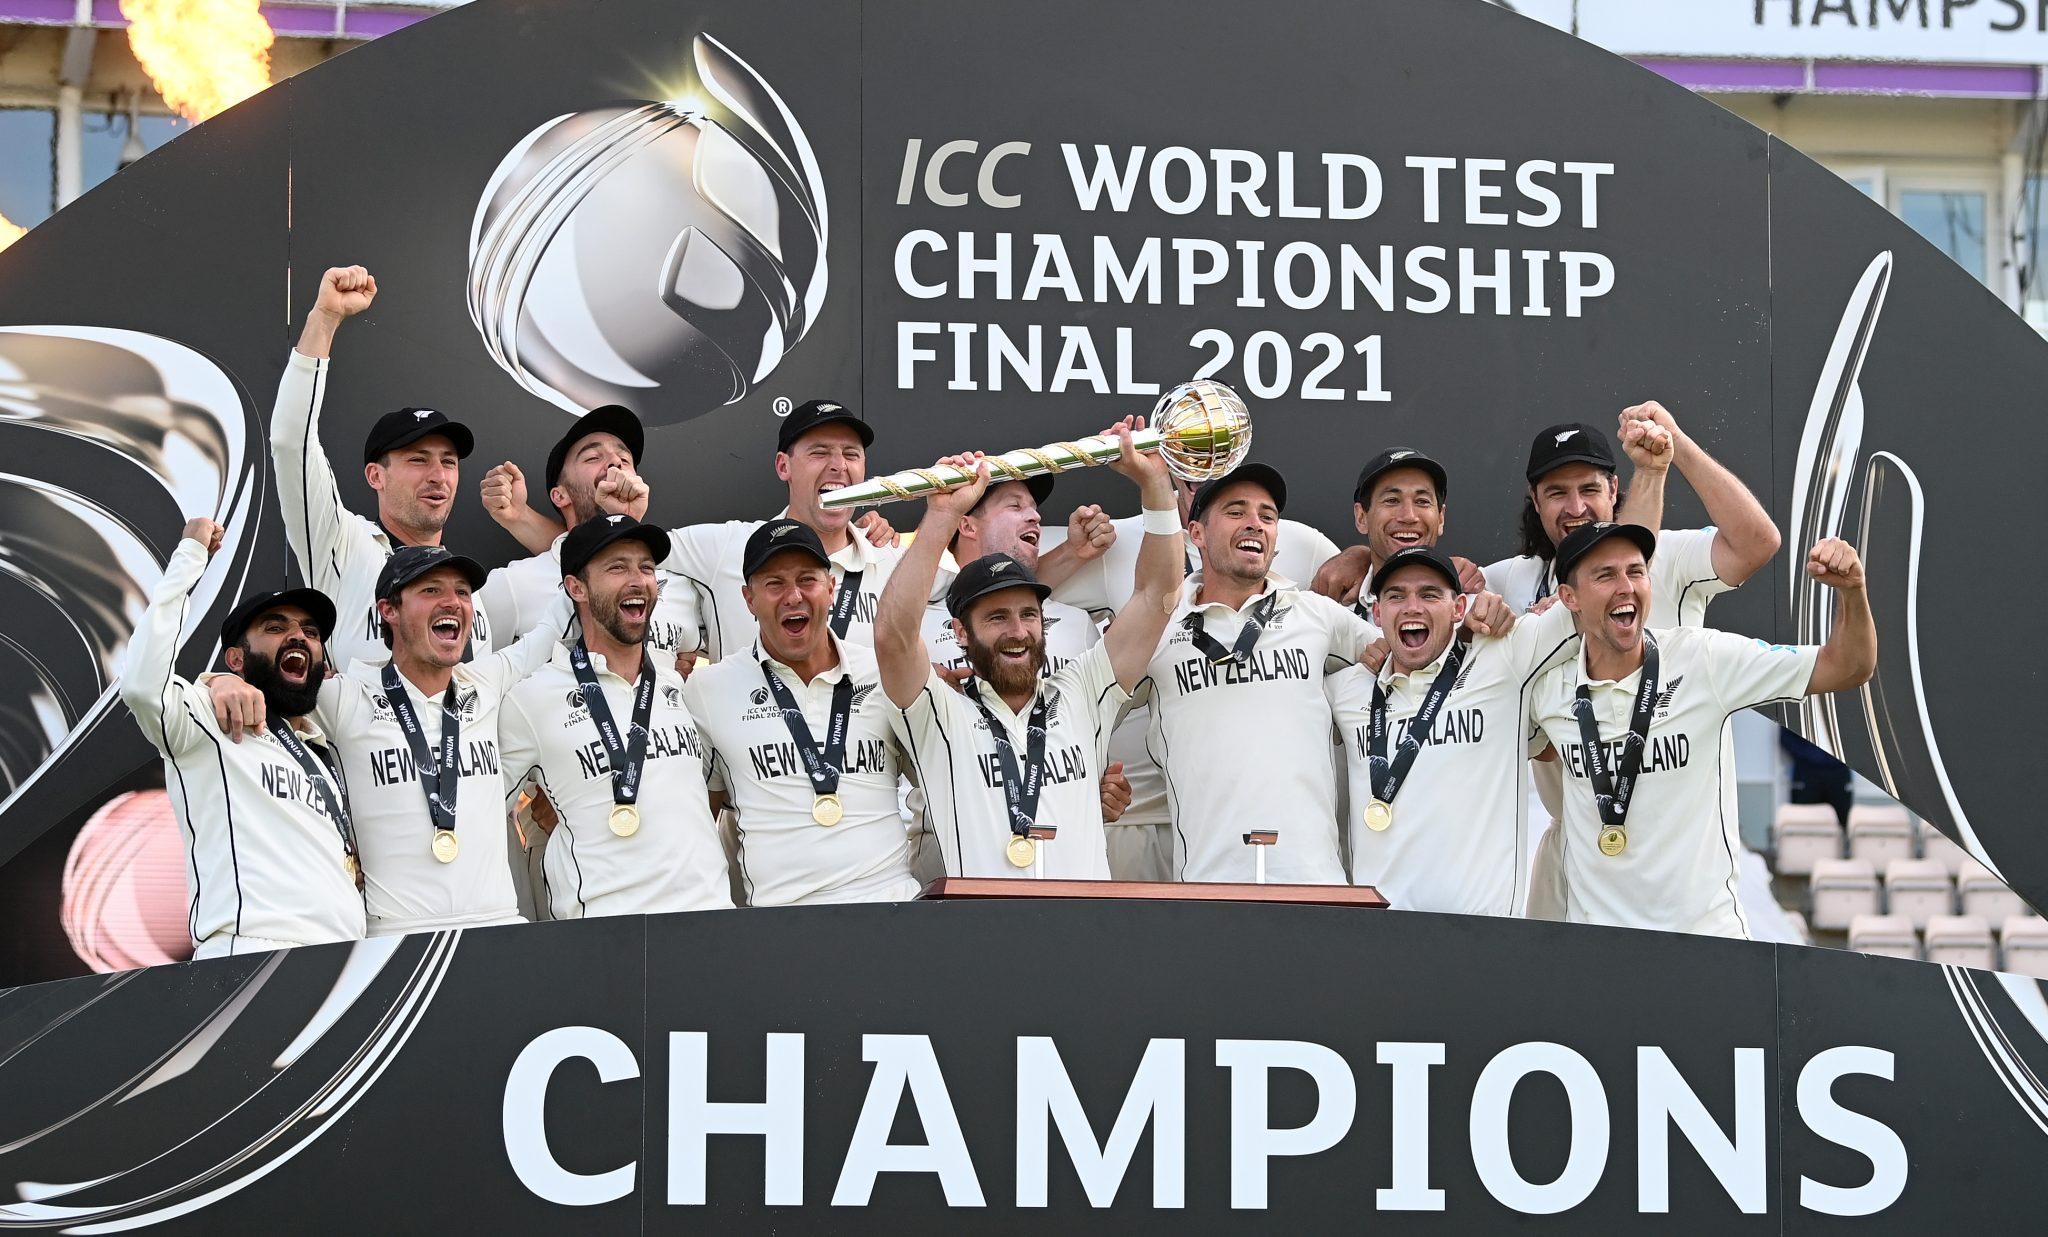 New Zealand crowned first ICC World Test Championship | நியூசிலாந்து முதல் ஐசிசி உலக டெஸ்ட் சாம்பியன்ஷிப்பை வென்றது |_40.1